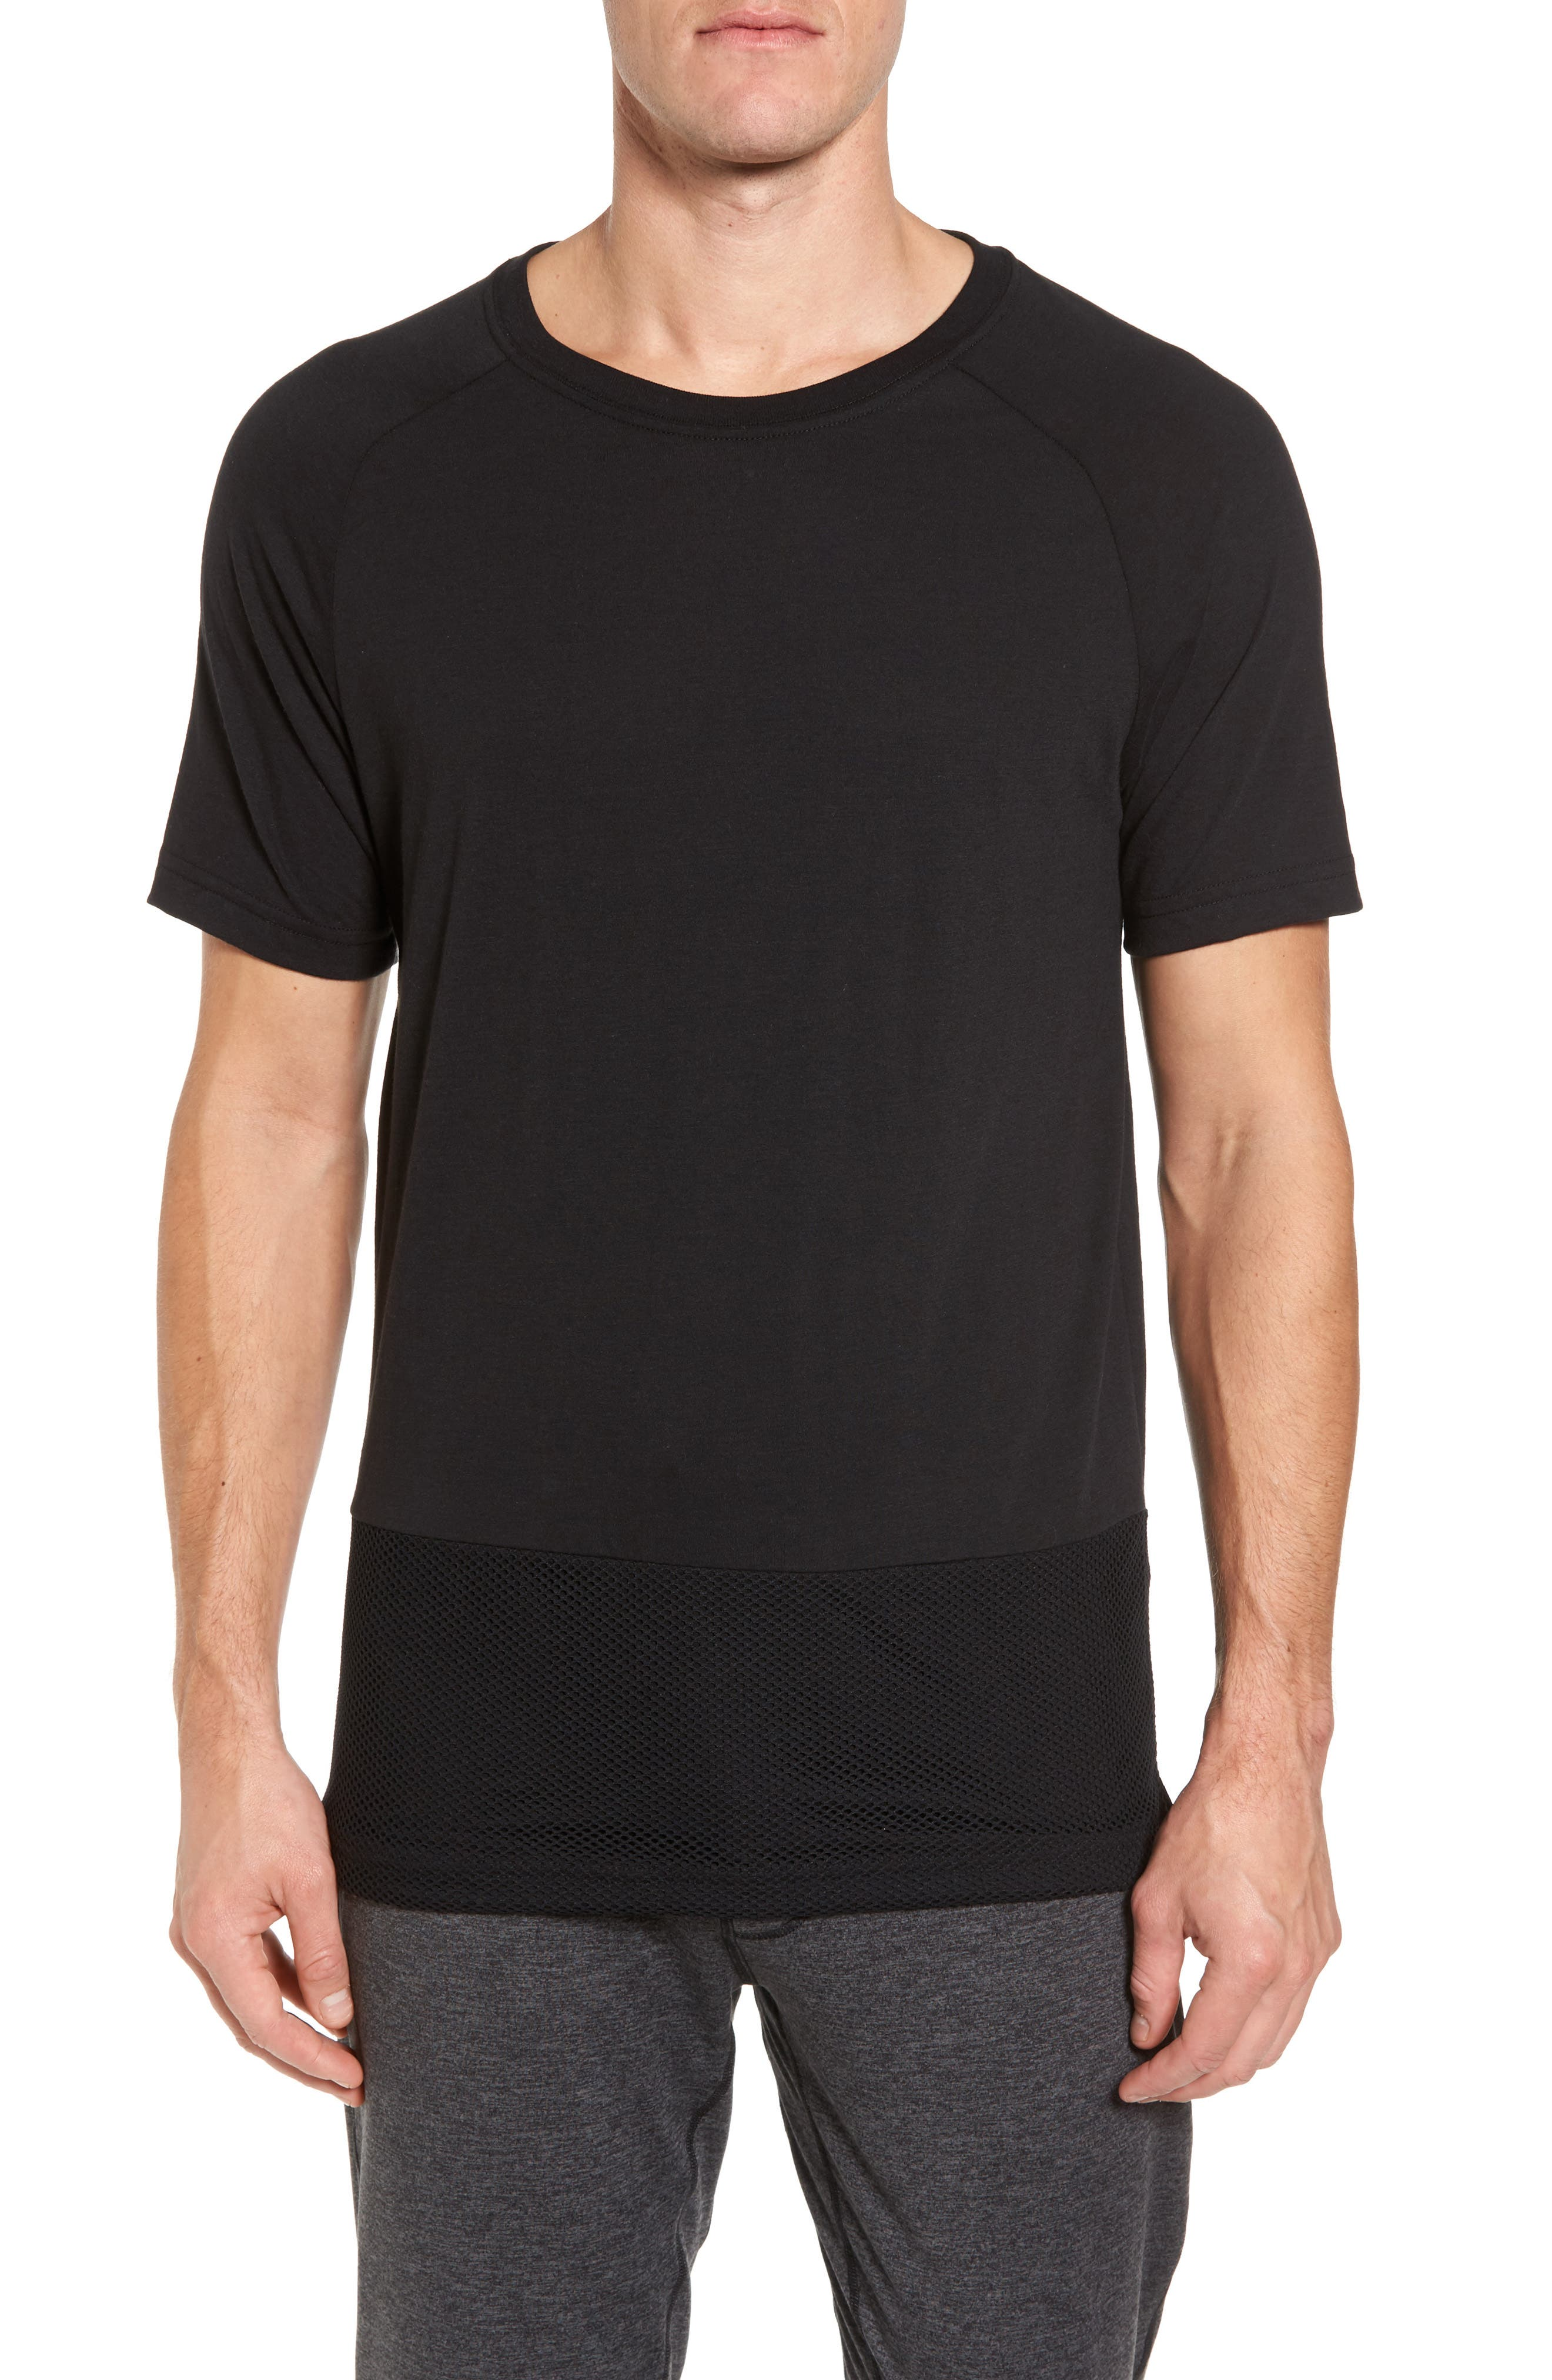 Darma Mesh Hemmed T-Shirt,                             Main thumbnail 1, color,                             BLACK